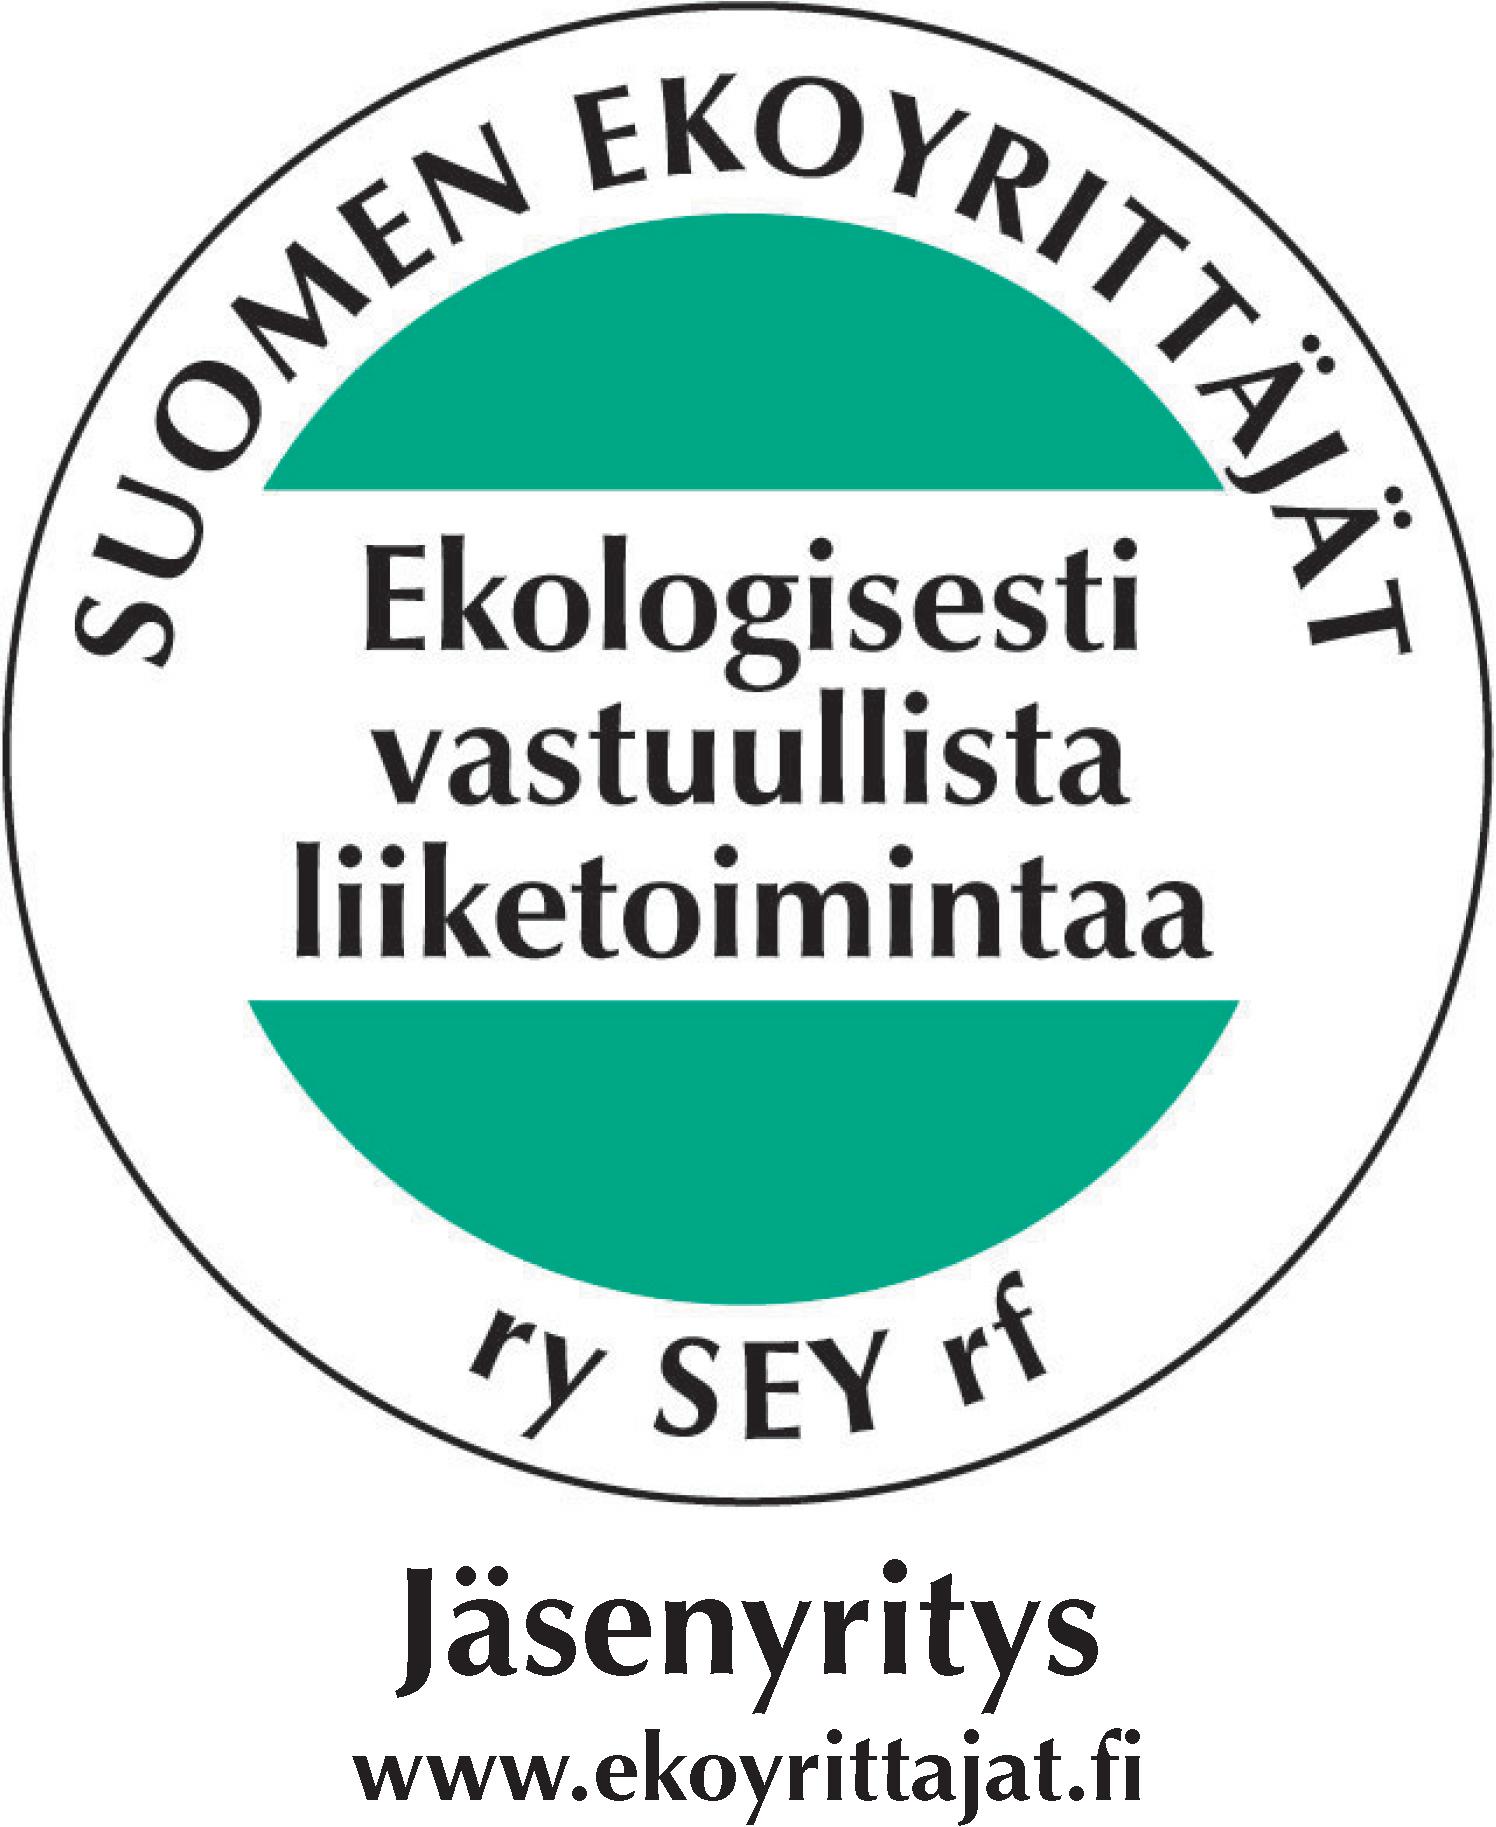 Ekoyrittäjät_logo